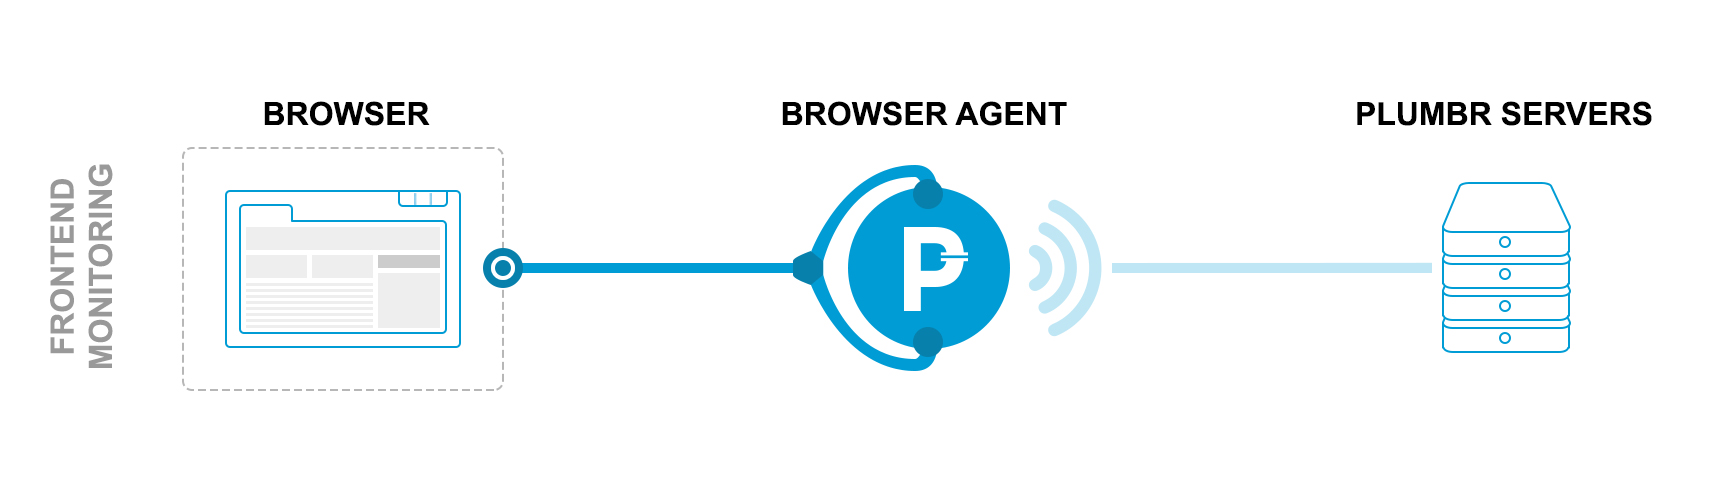 Plumbr Browser concept